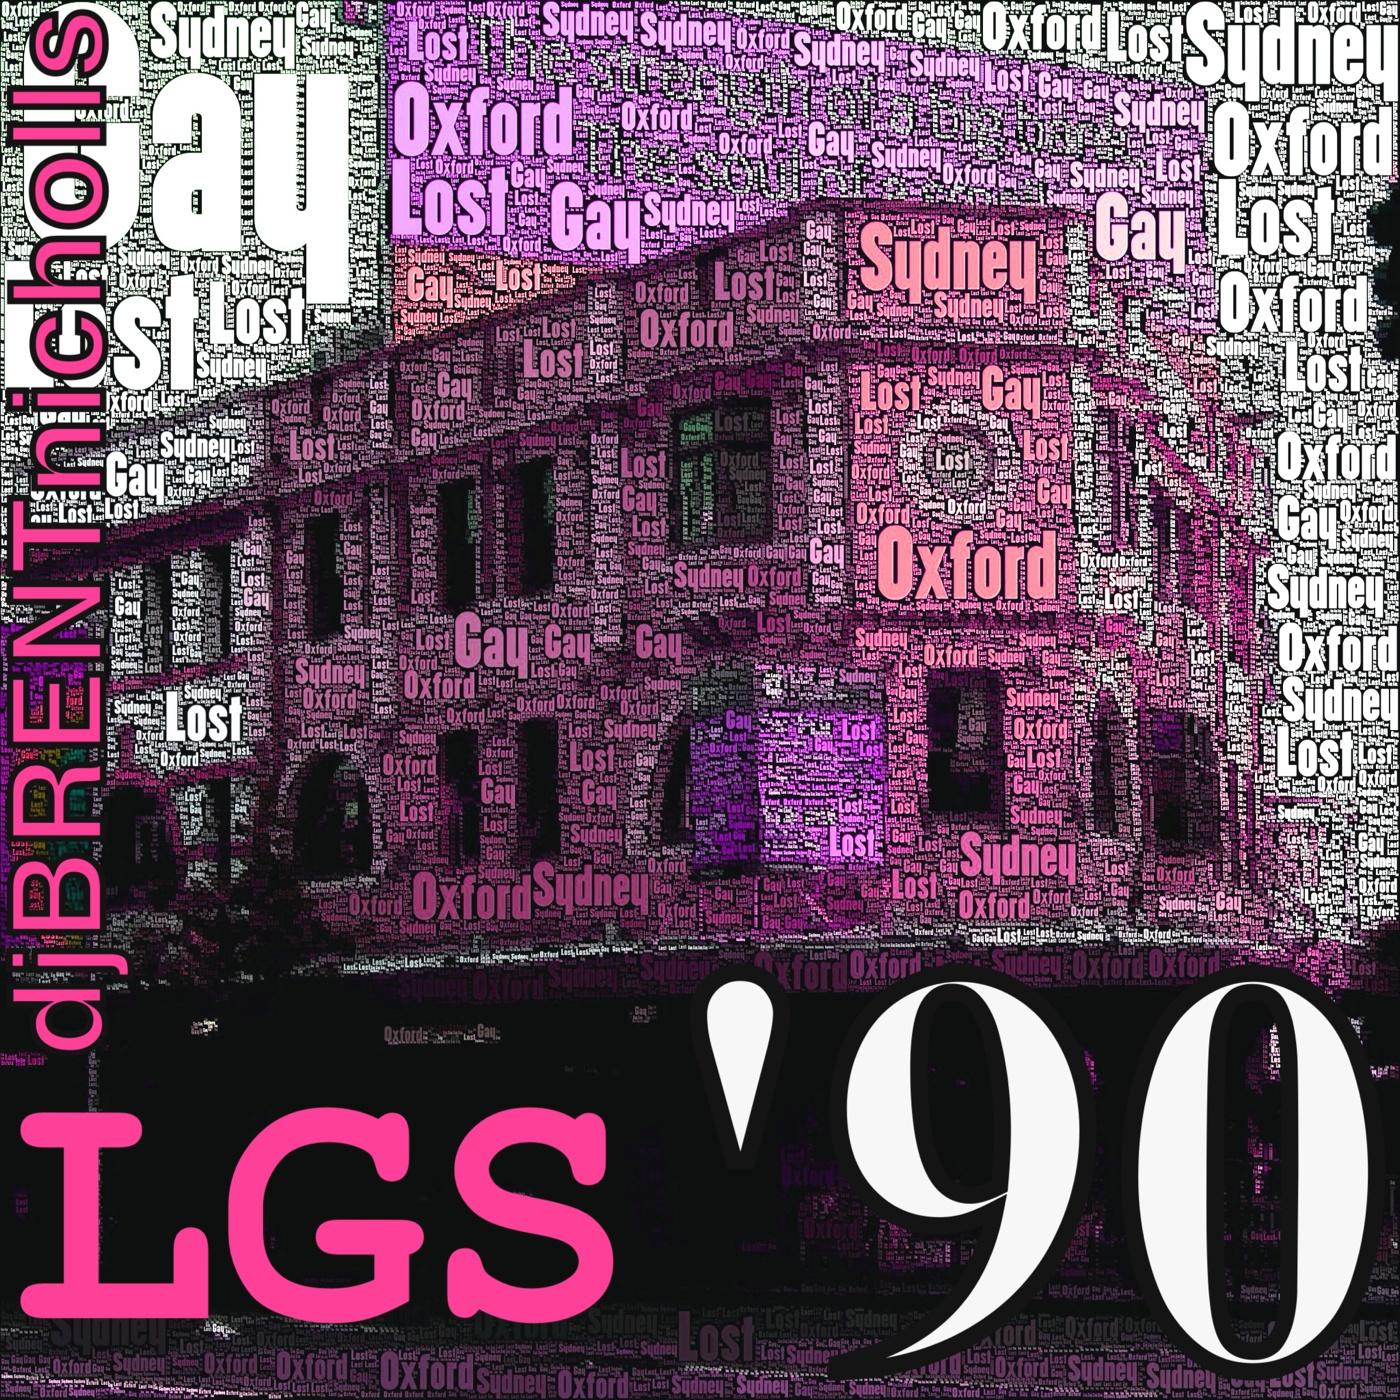 RETRO: LGS 1990